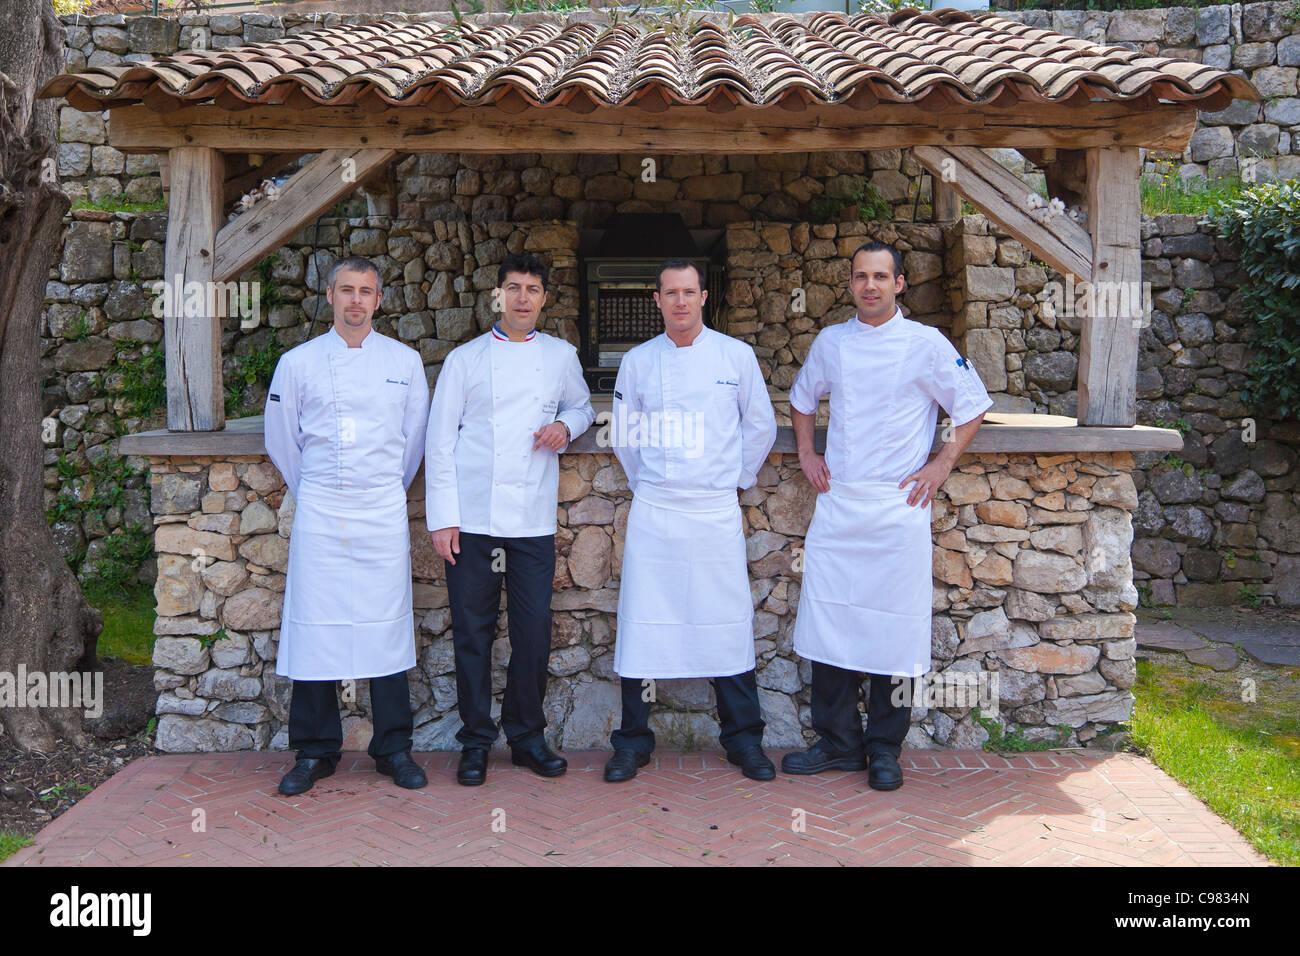 The chef Yannick Franques and his brigad., CHATEAU SAINT-MARTIN & SPA - 2490 Avenue des Templiers - BP 102  - Stock Image